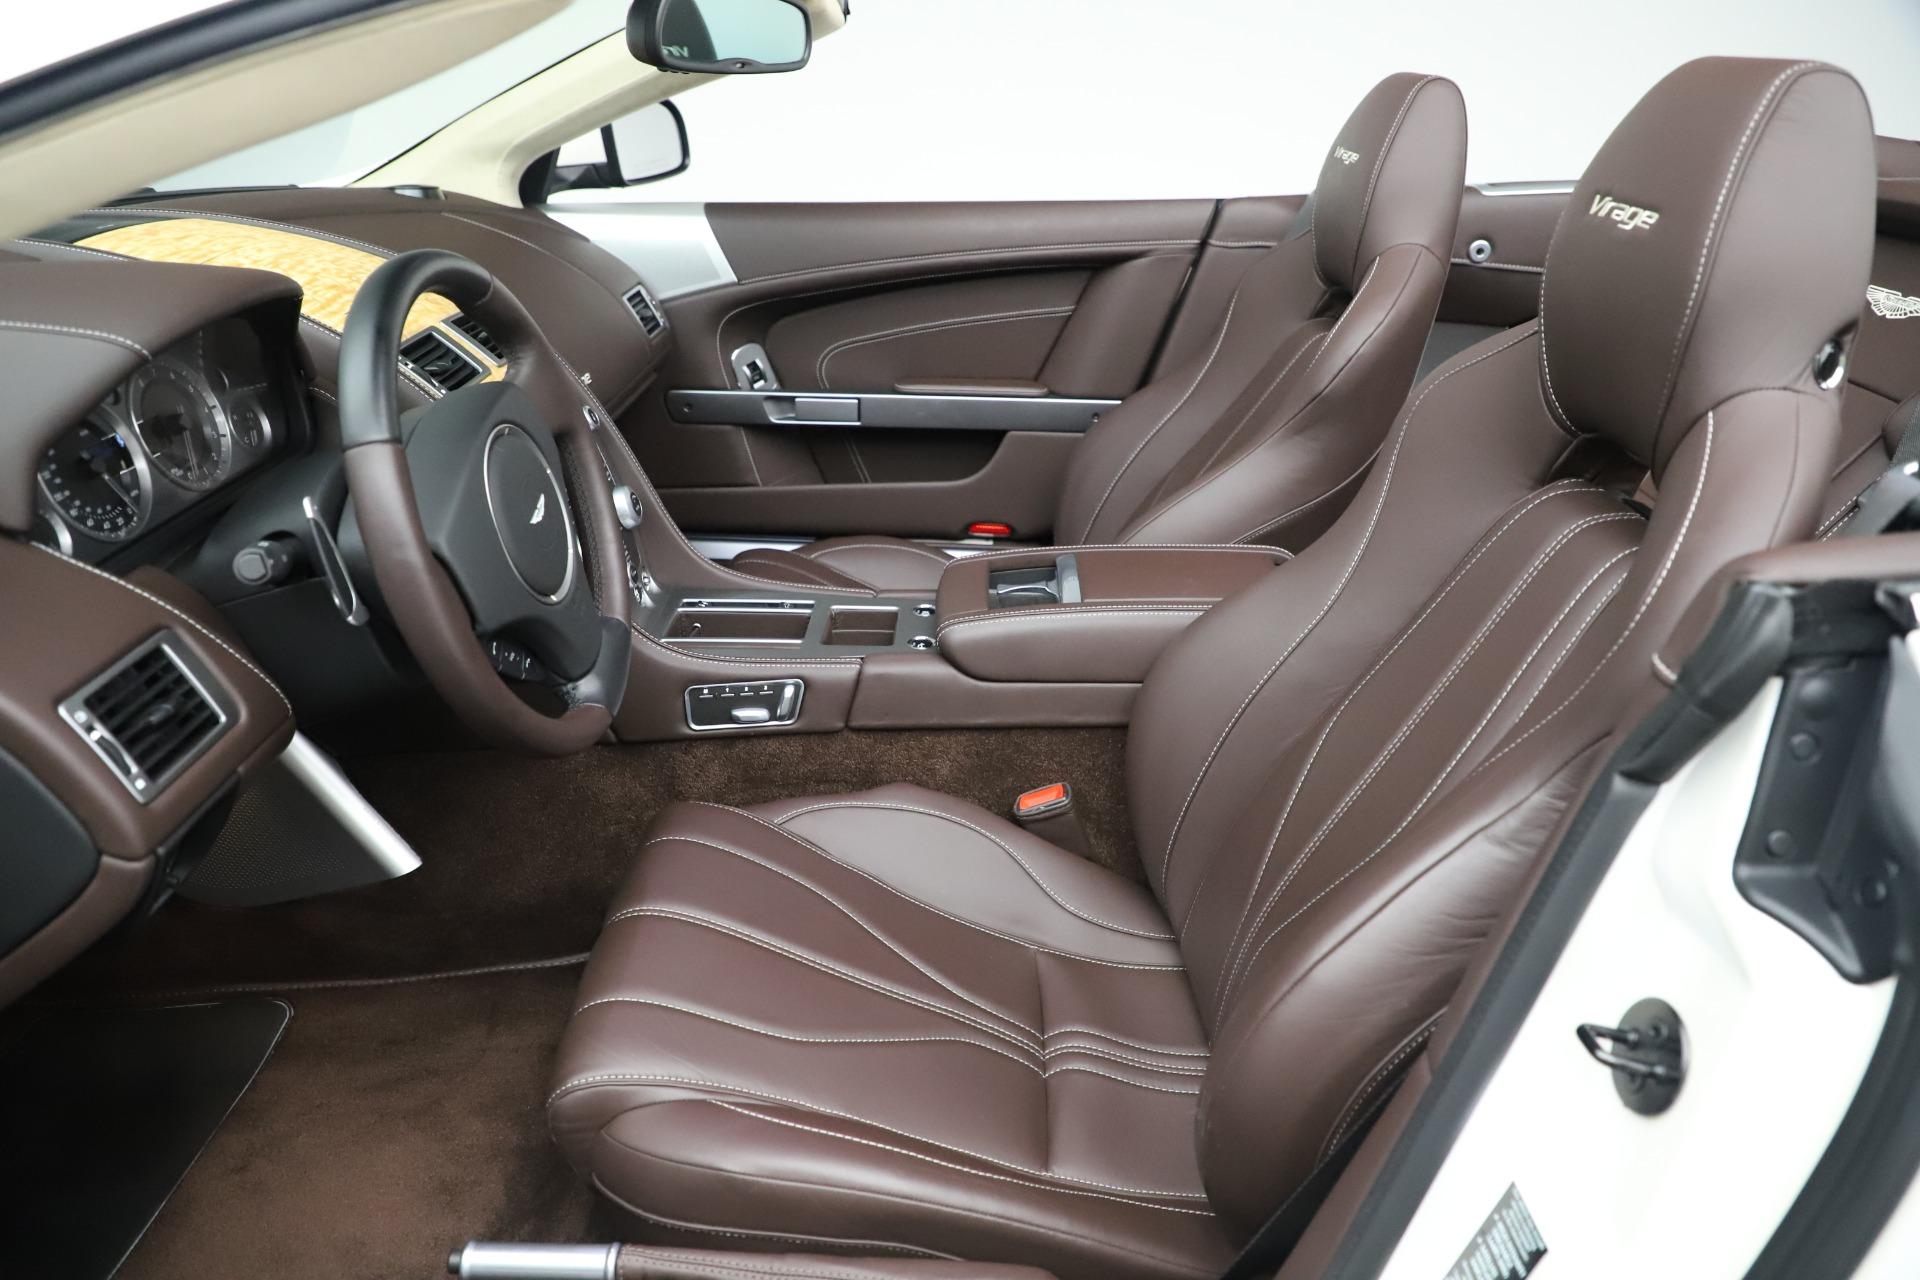 Used 2012 Aston Martin Virage Volante For Sale In Westport, CT 3515_p20